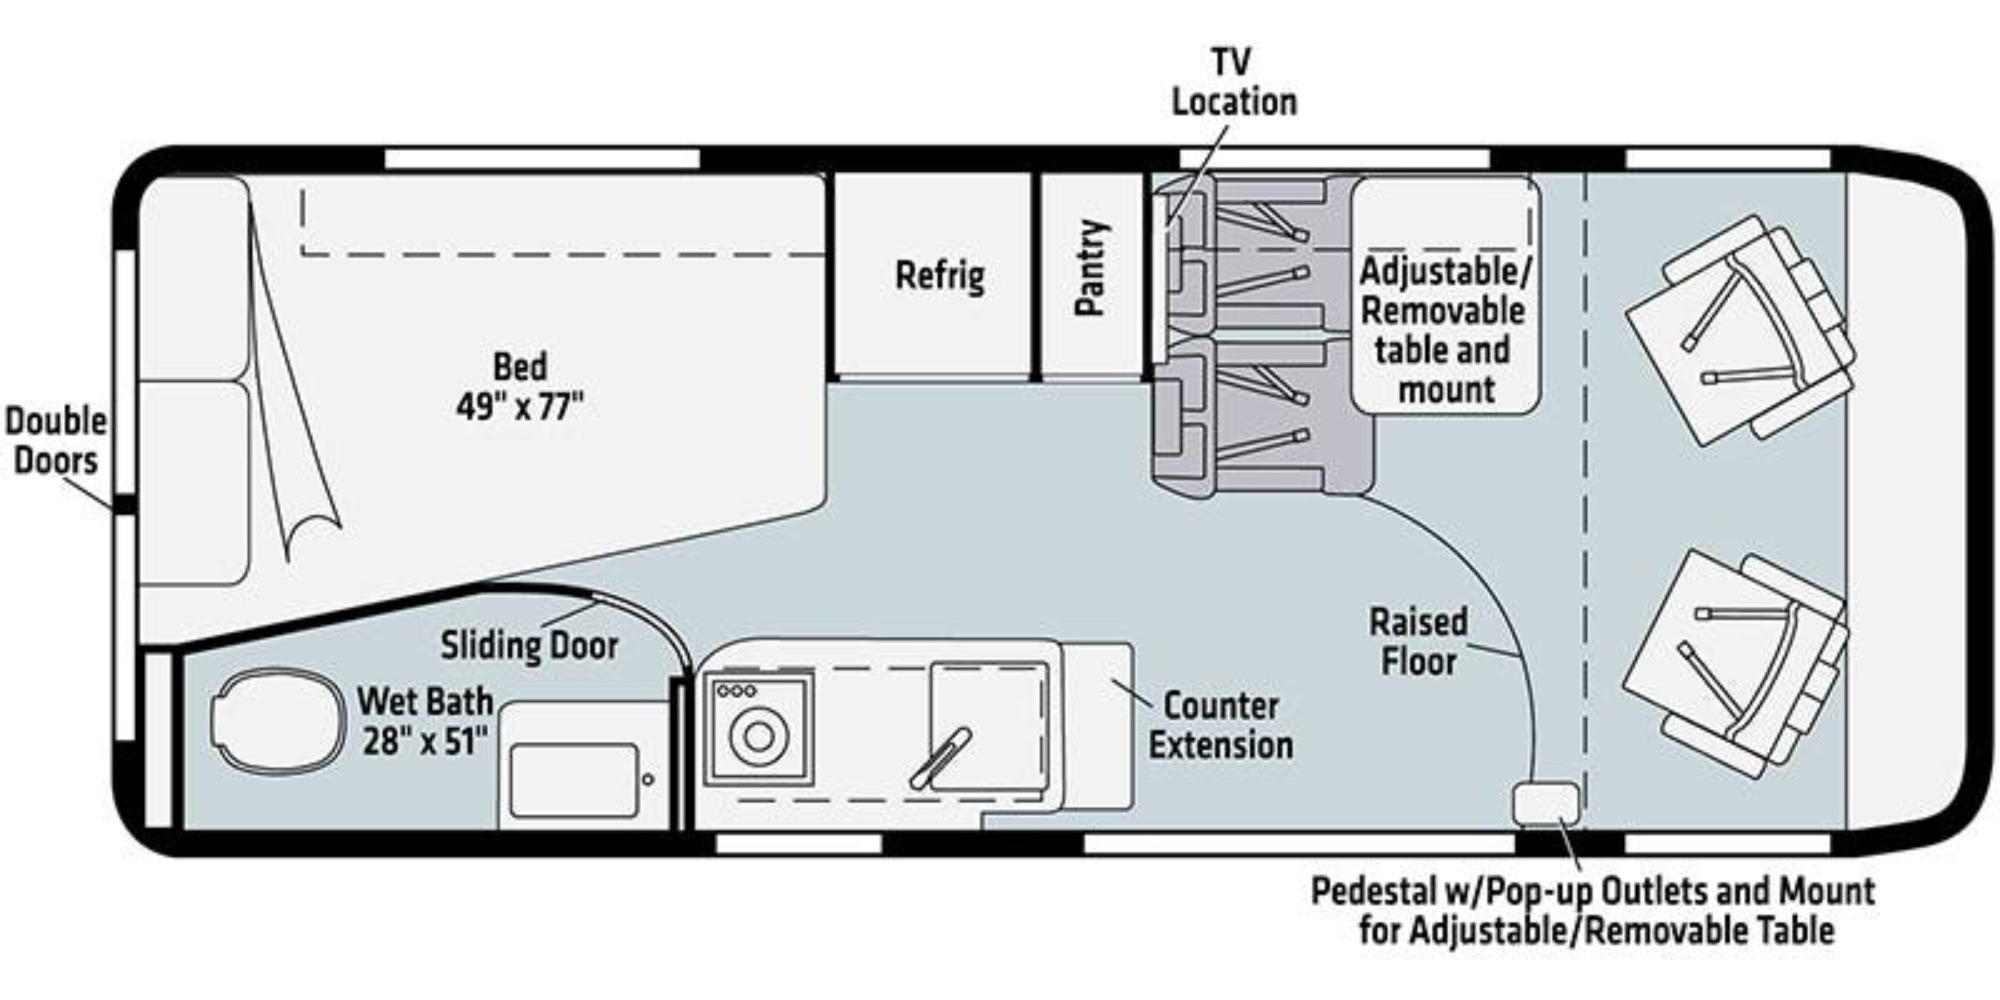 View Floor Plan for 2022 WINNEBAGO TRAVATO 59G